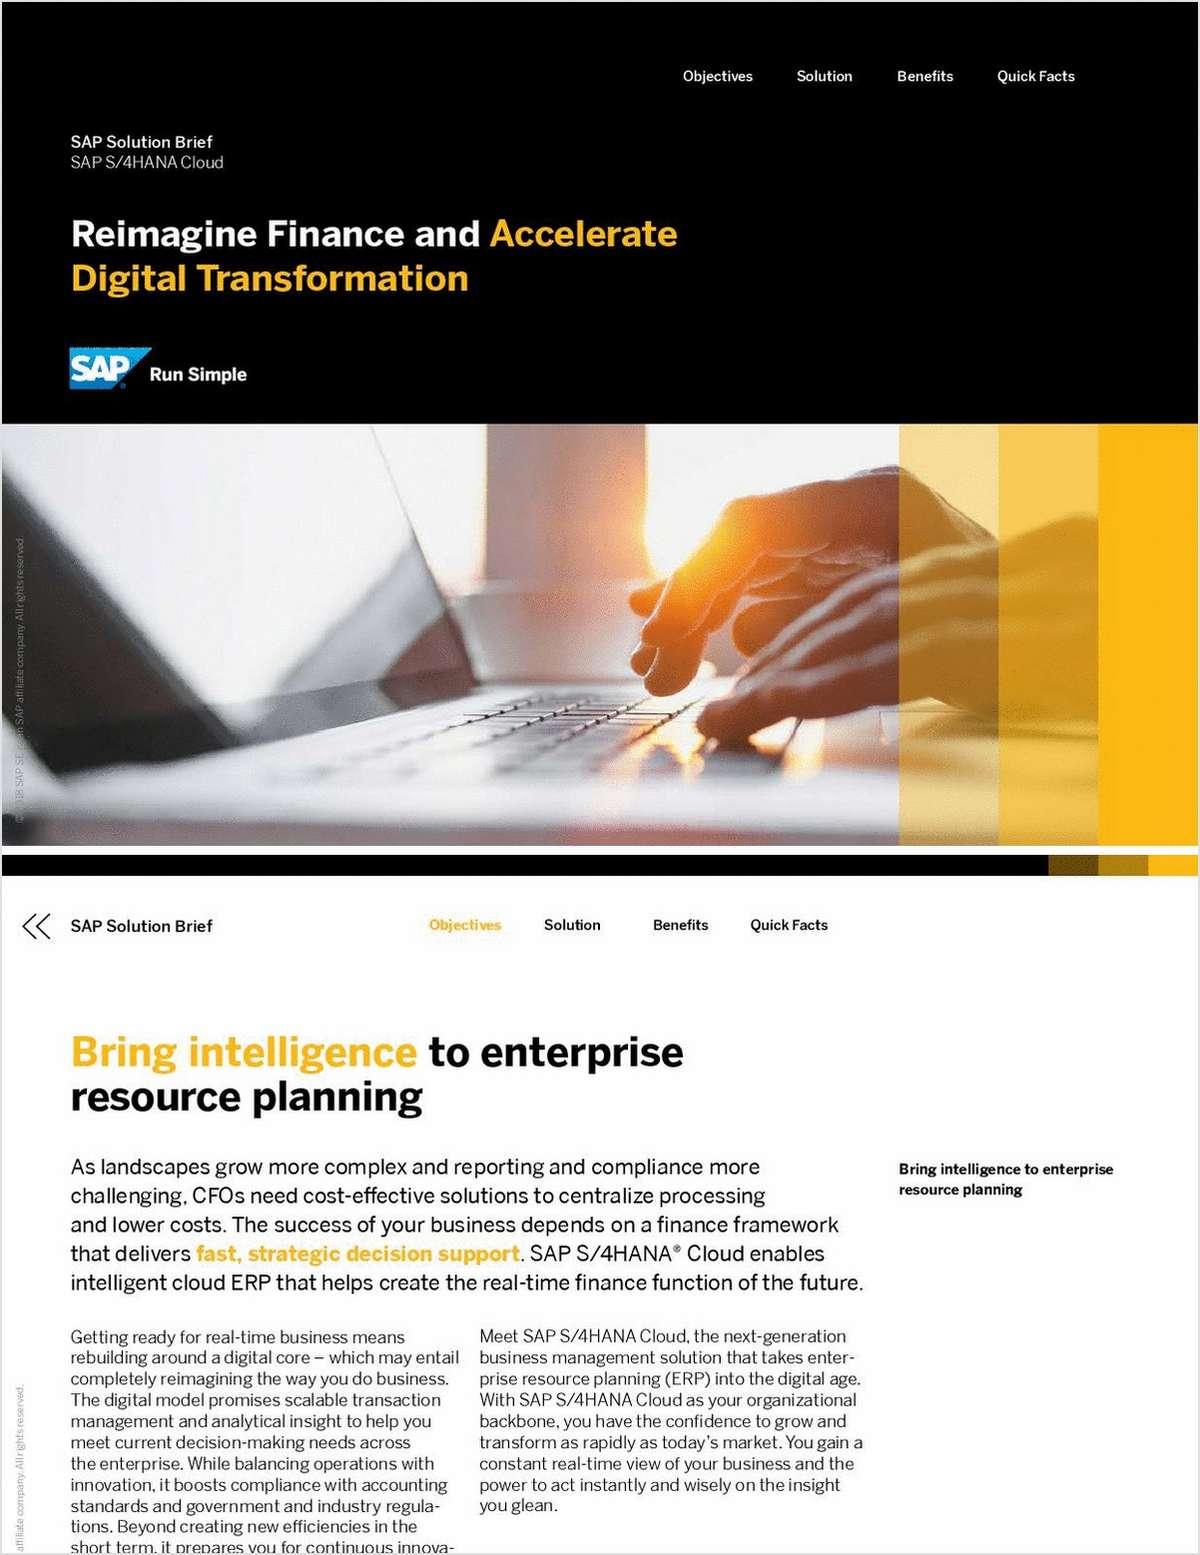 Reimagine Finance and Accelerate Digital Transformation